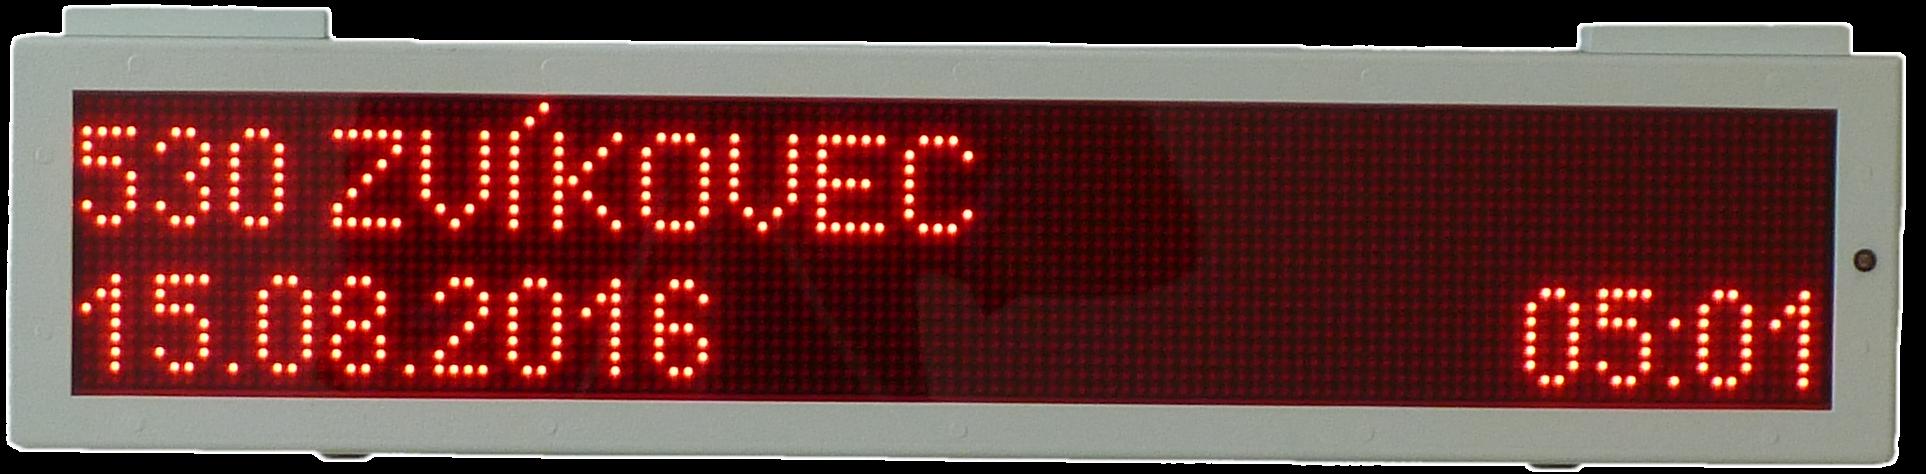 Vozidlový vnitřní LED panel dvojřádkový jednostranný - VLP 20×120.